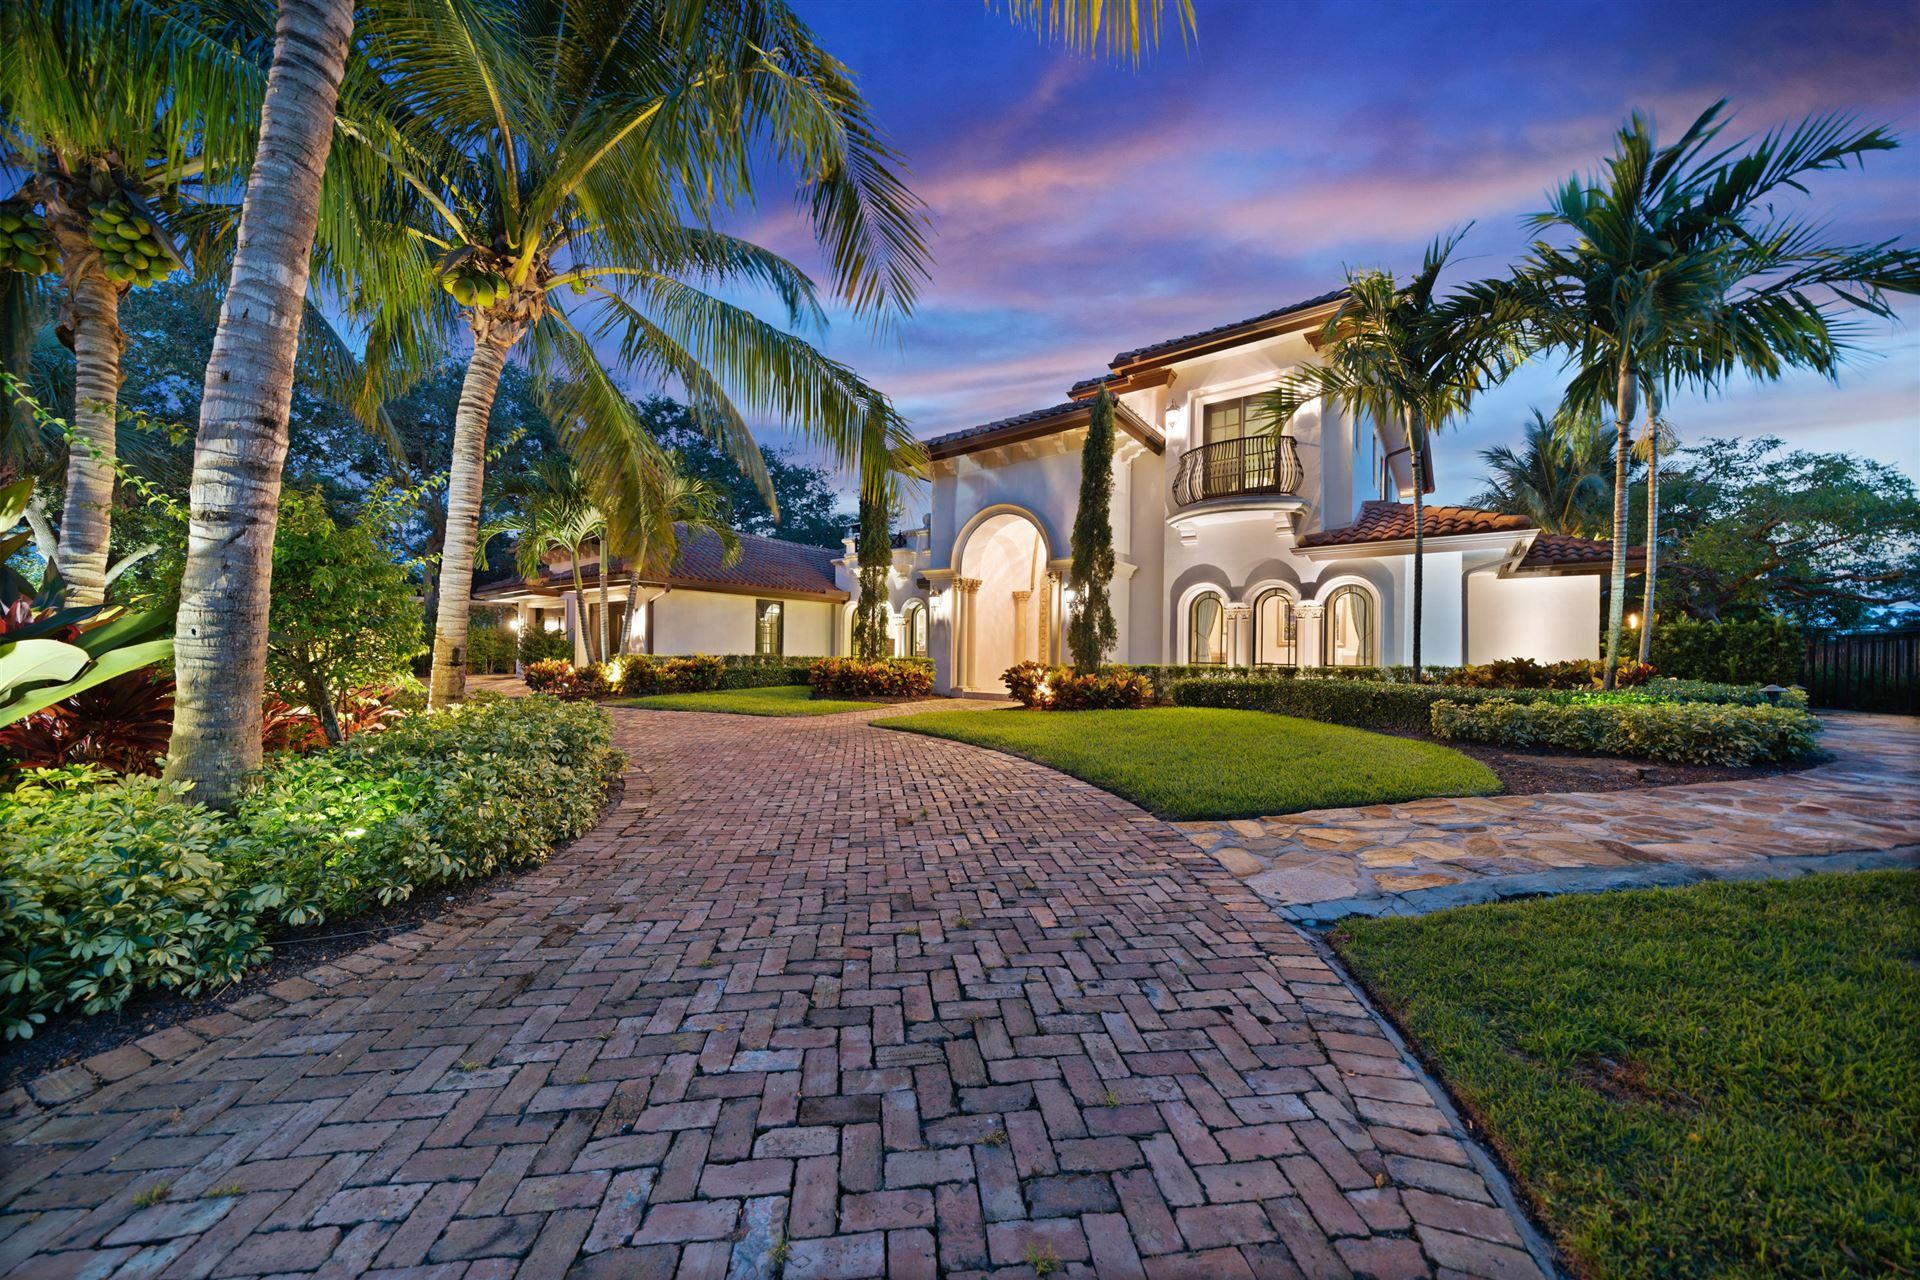 Photo of 4816 S Lake Drive, Boynton Beach, FL 33436 (MLS # RX-10672015)